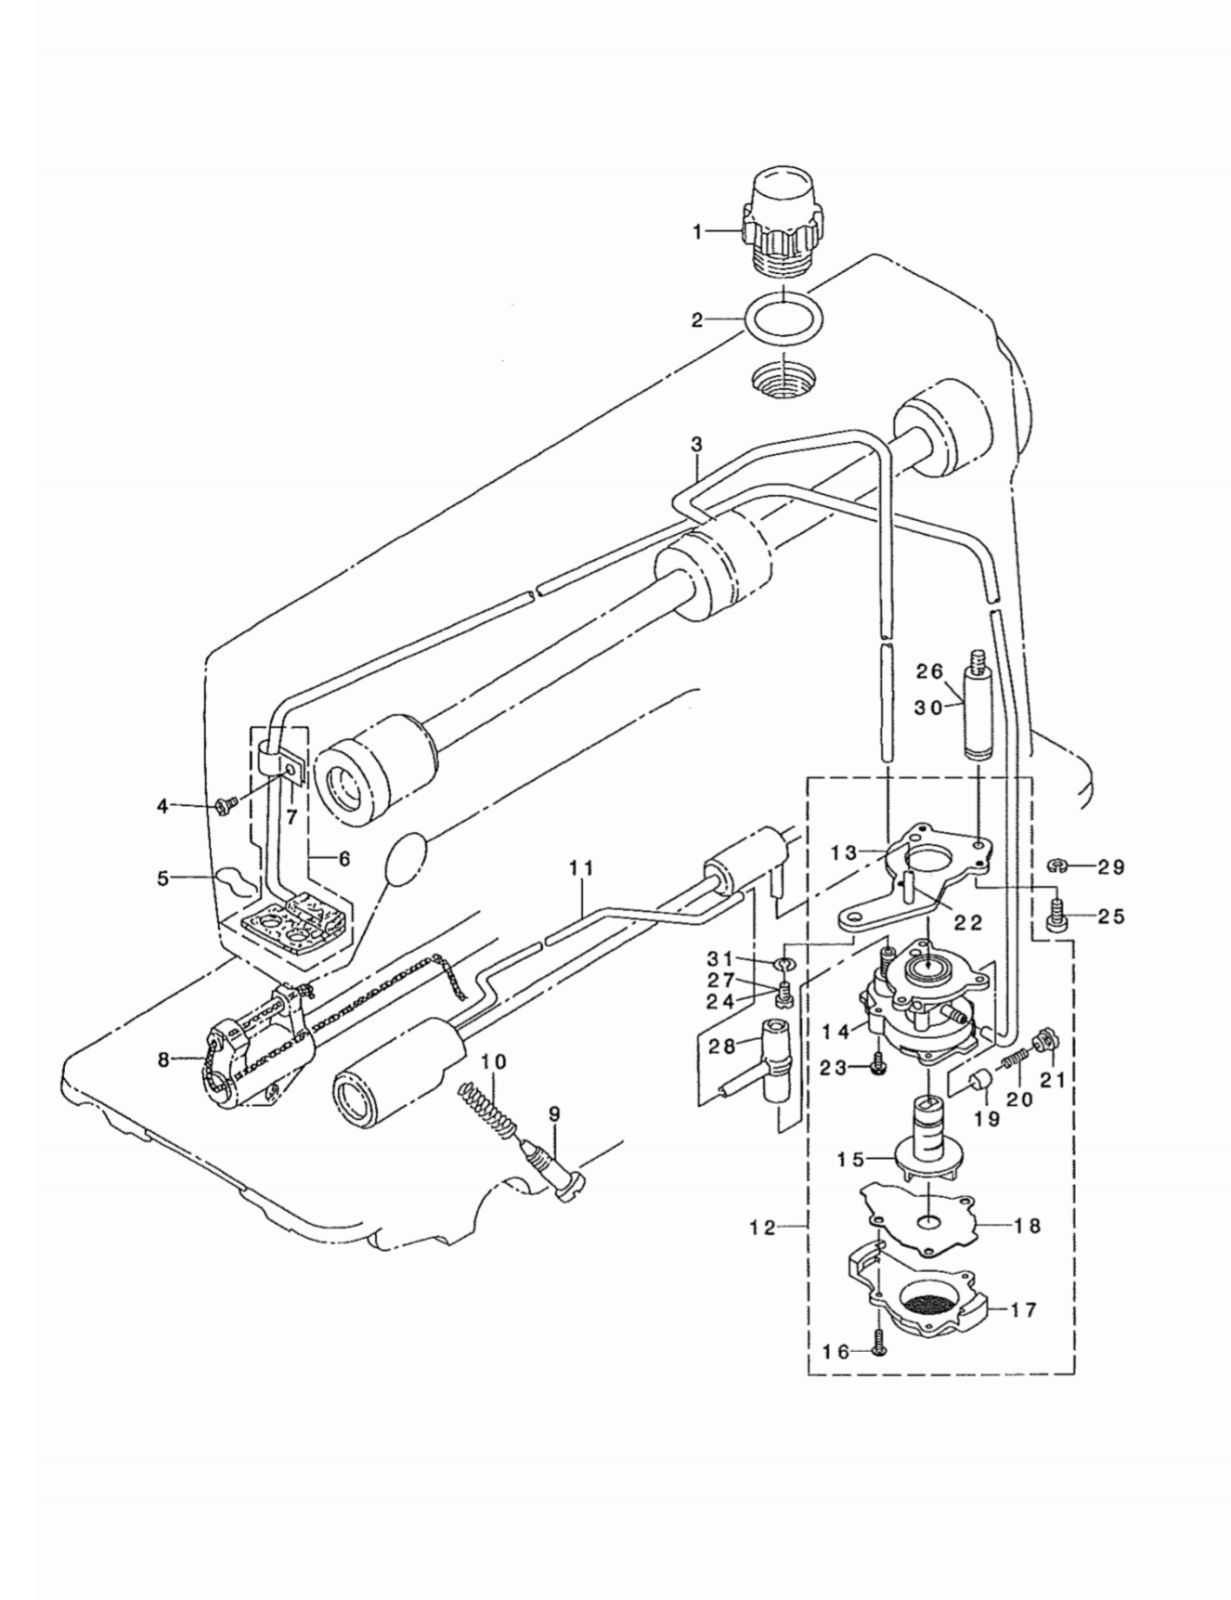 Lubricaton Oil Pump Assembly Part B 555 0a0 Juki